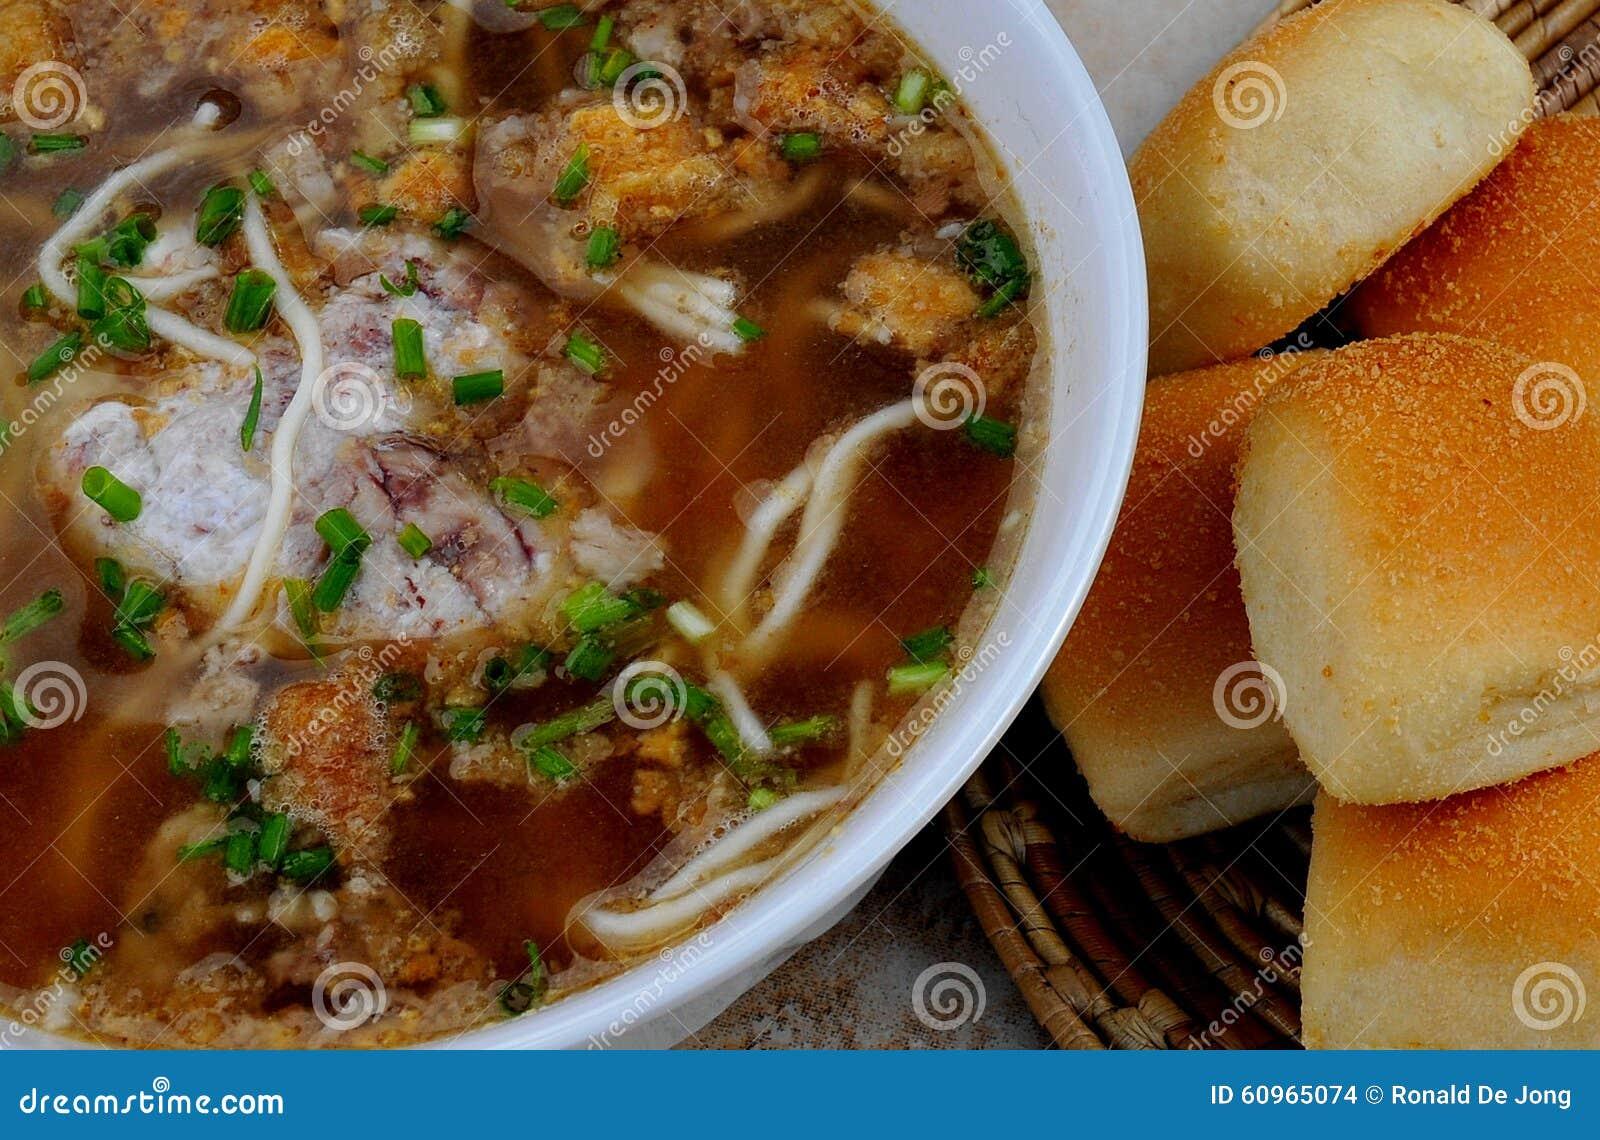 Food from the Philippines, Batchoy Utak